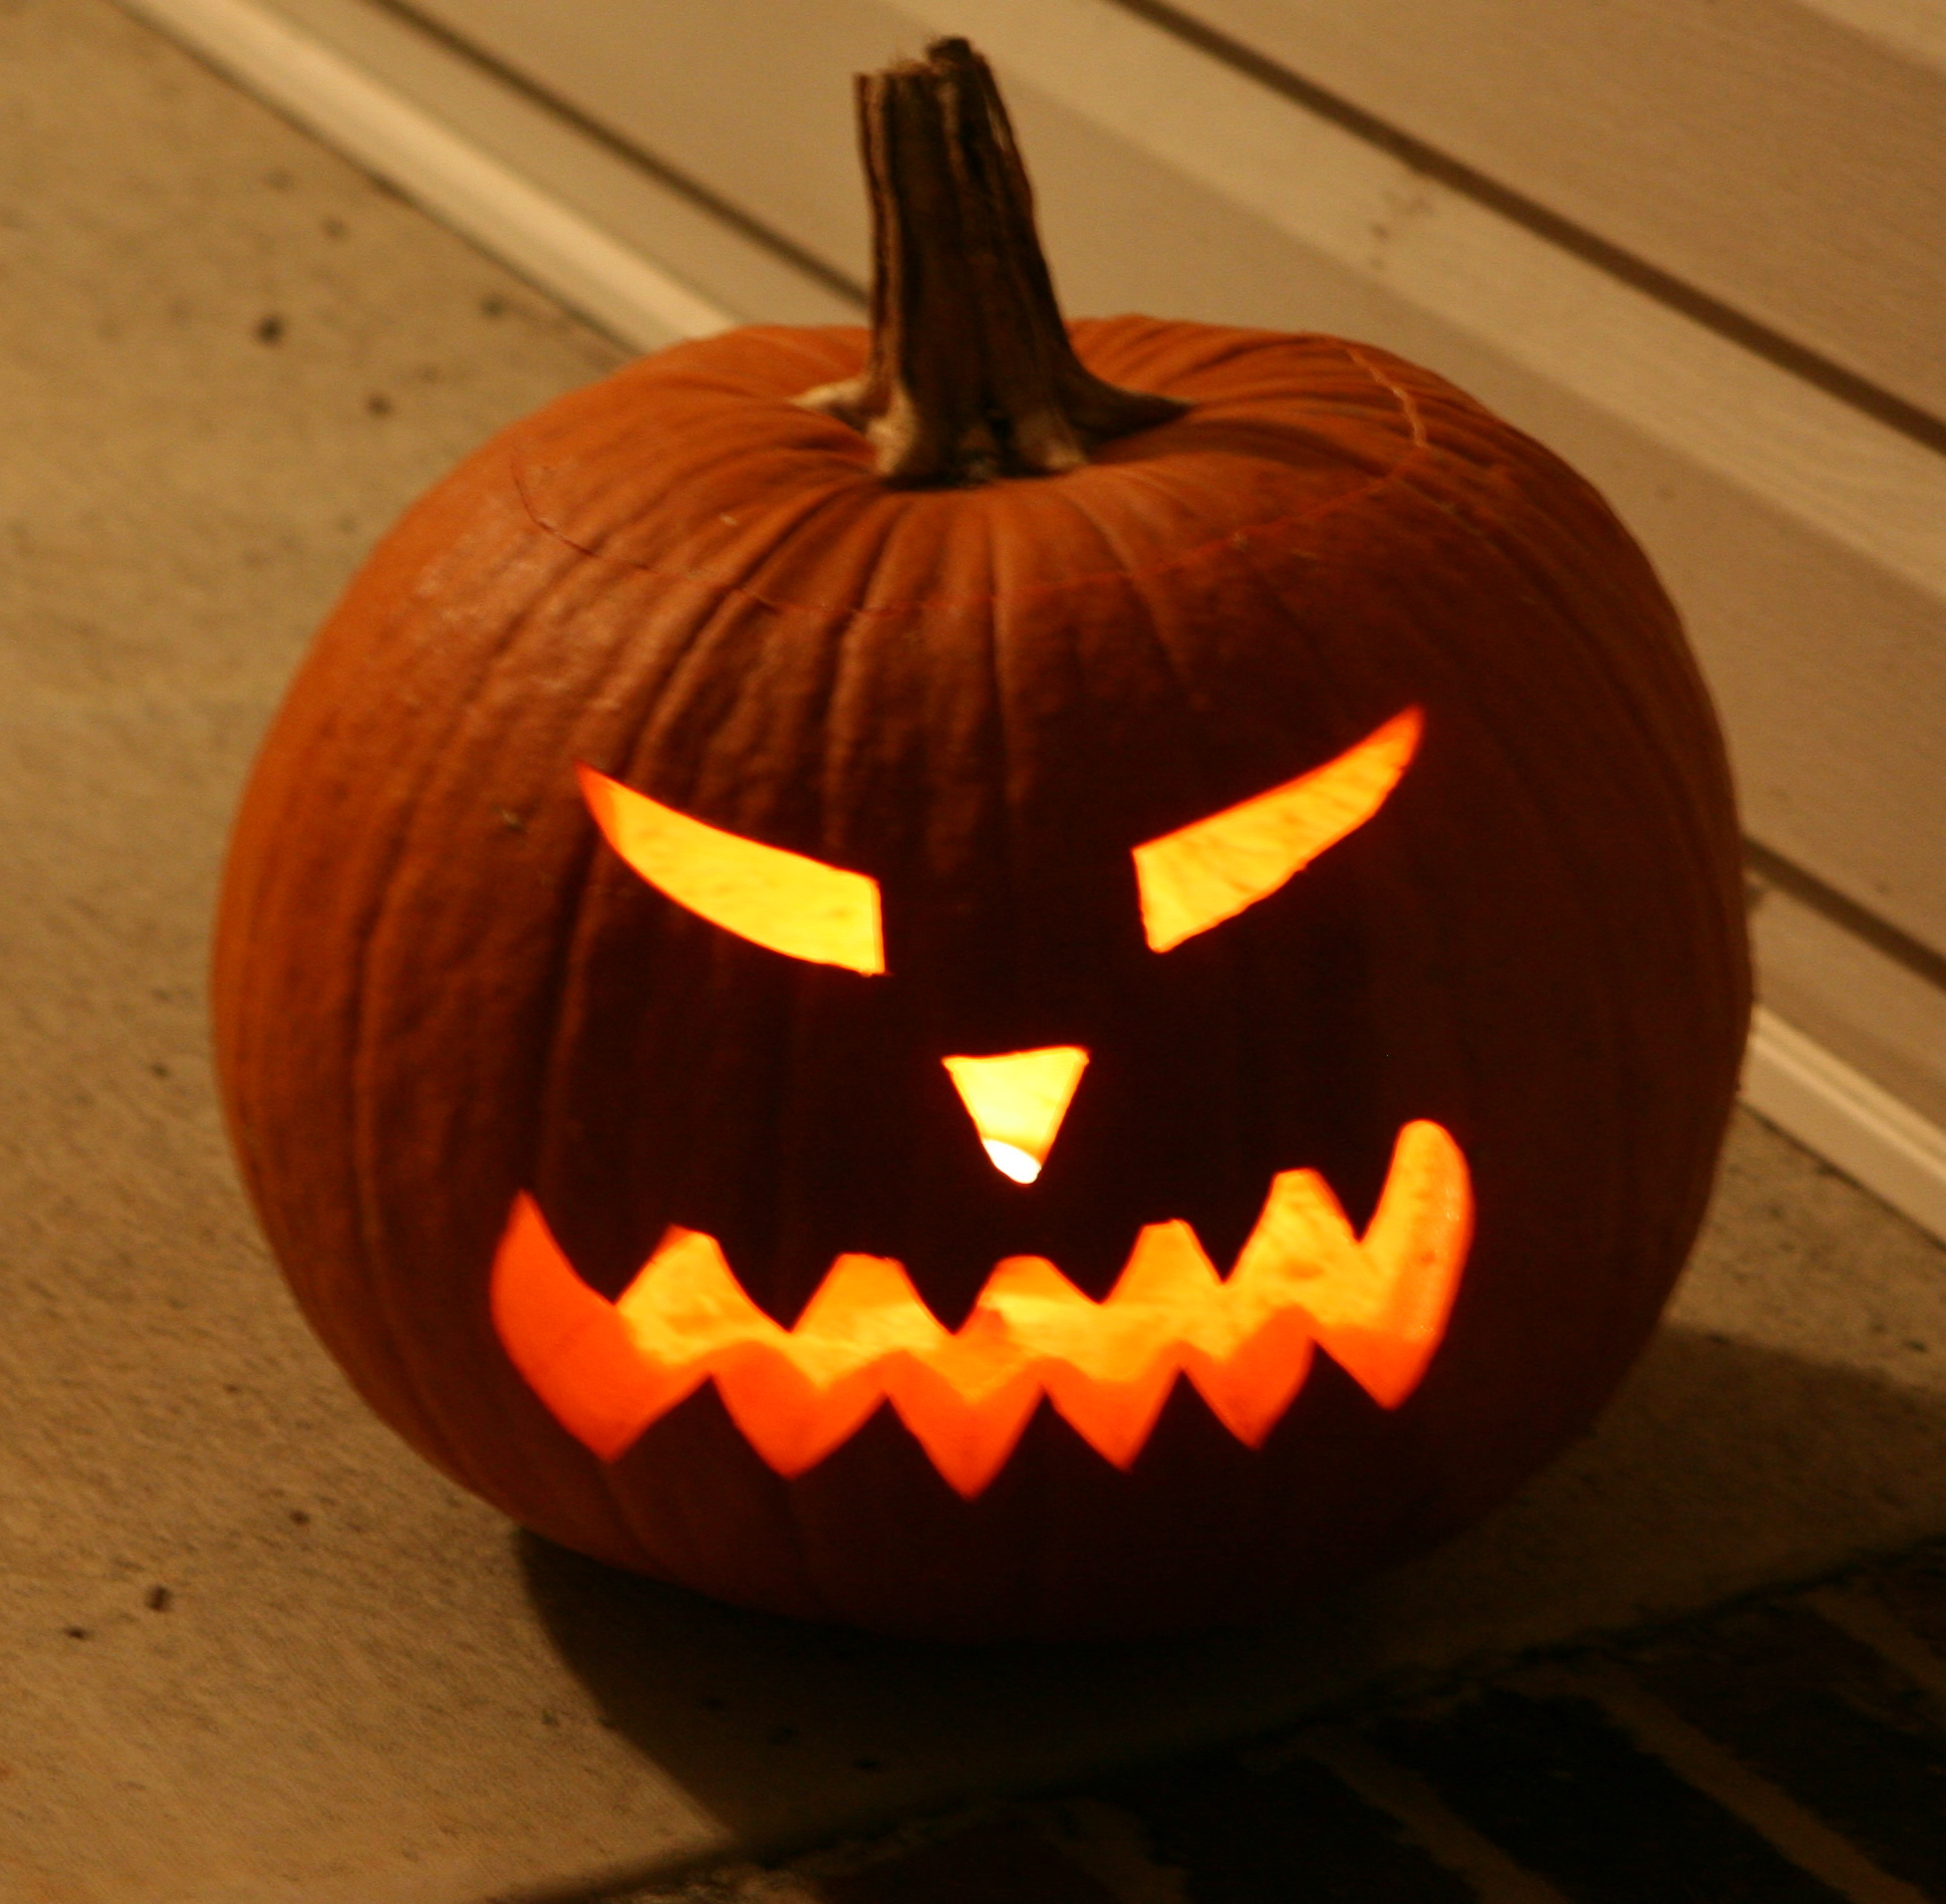 Uncategorized Halloween Jack O Lanterns image jack o lantern jpg pikmin fandom powered by wikia jpg